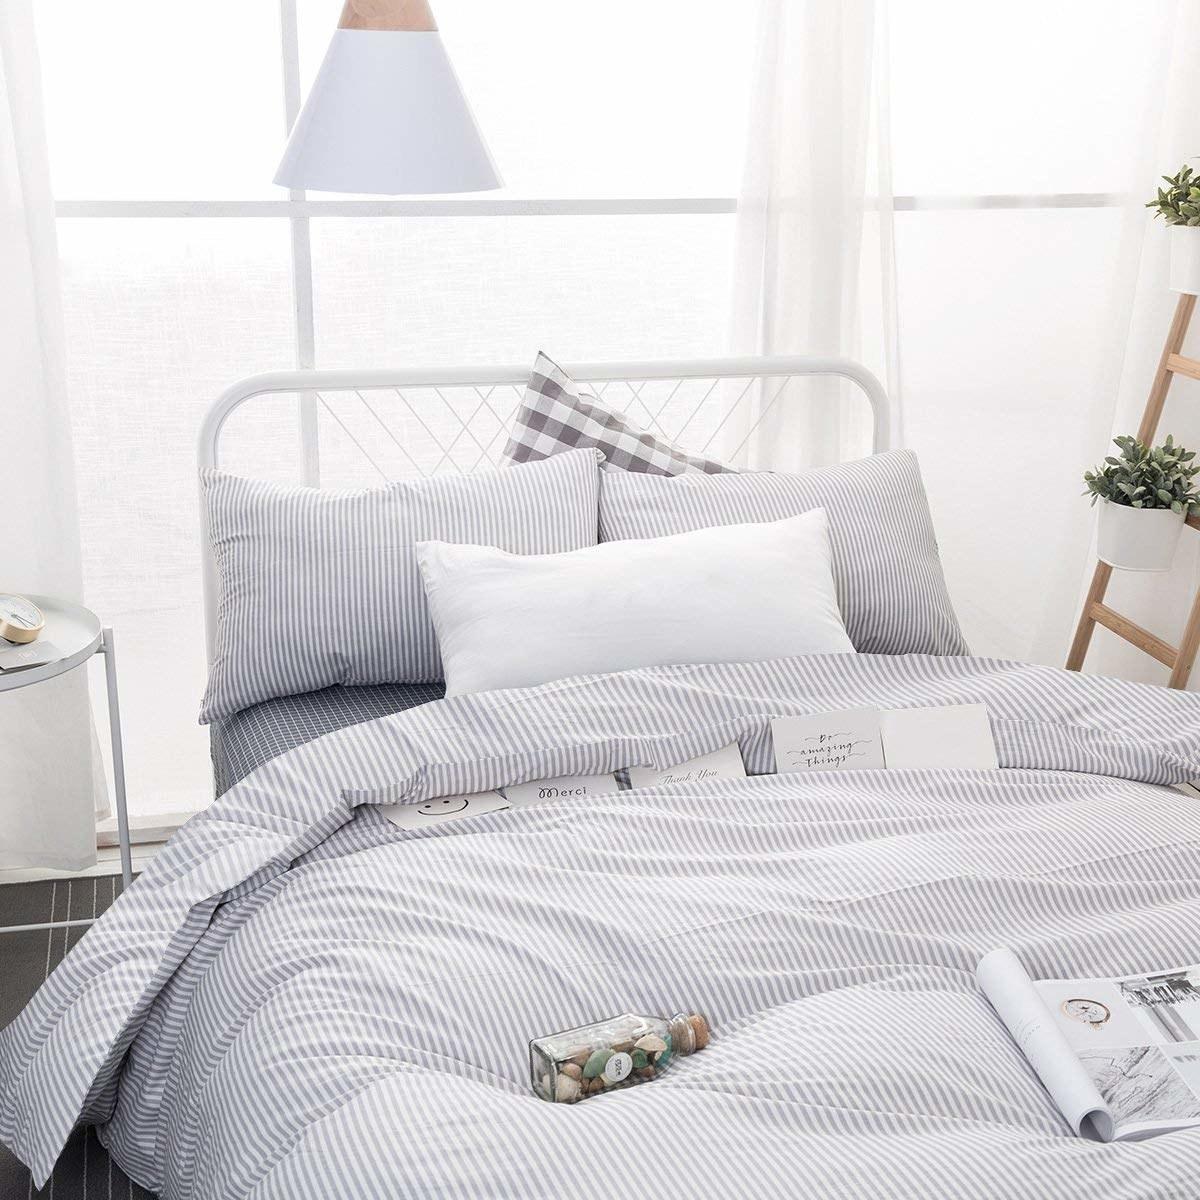 Light gray striped duvet on a bed